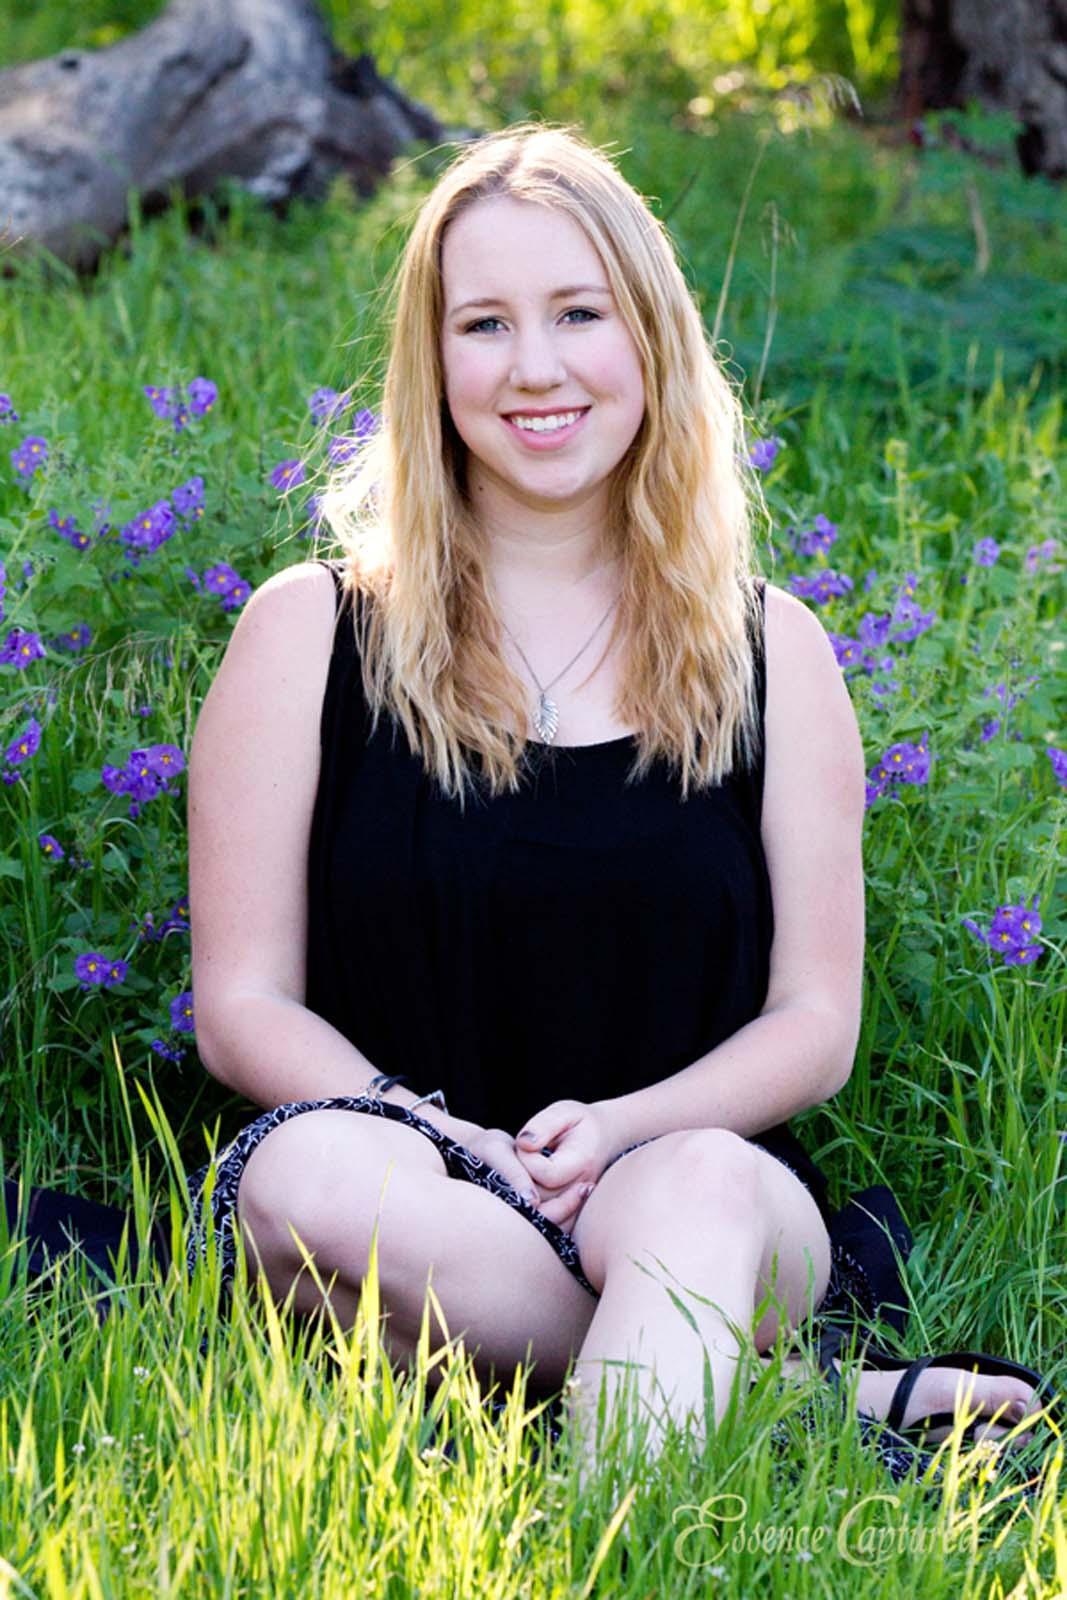 female high school senior portrait blonde hair black dress sitting in spring setting purple wildflowers green grass